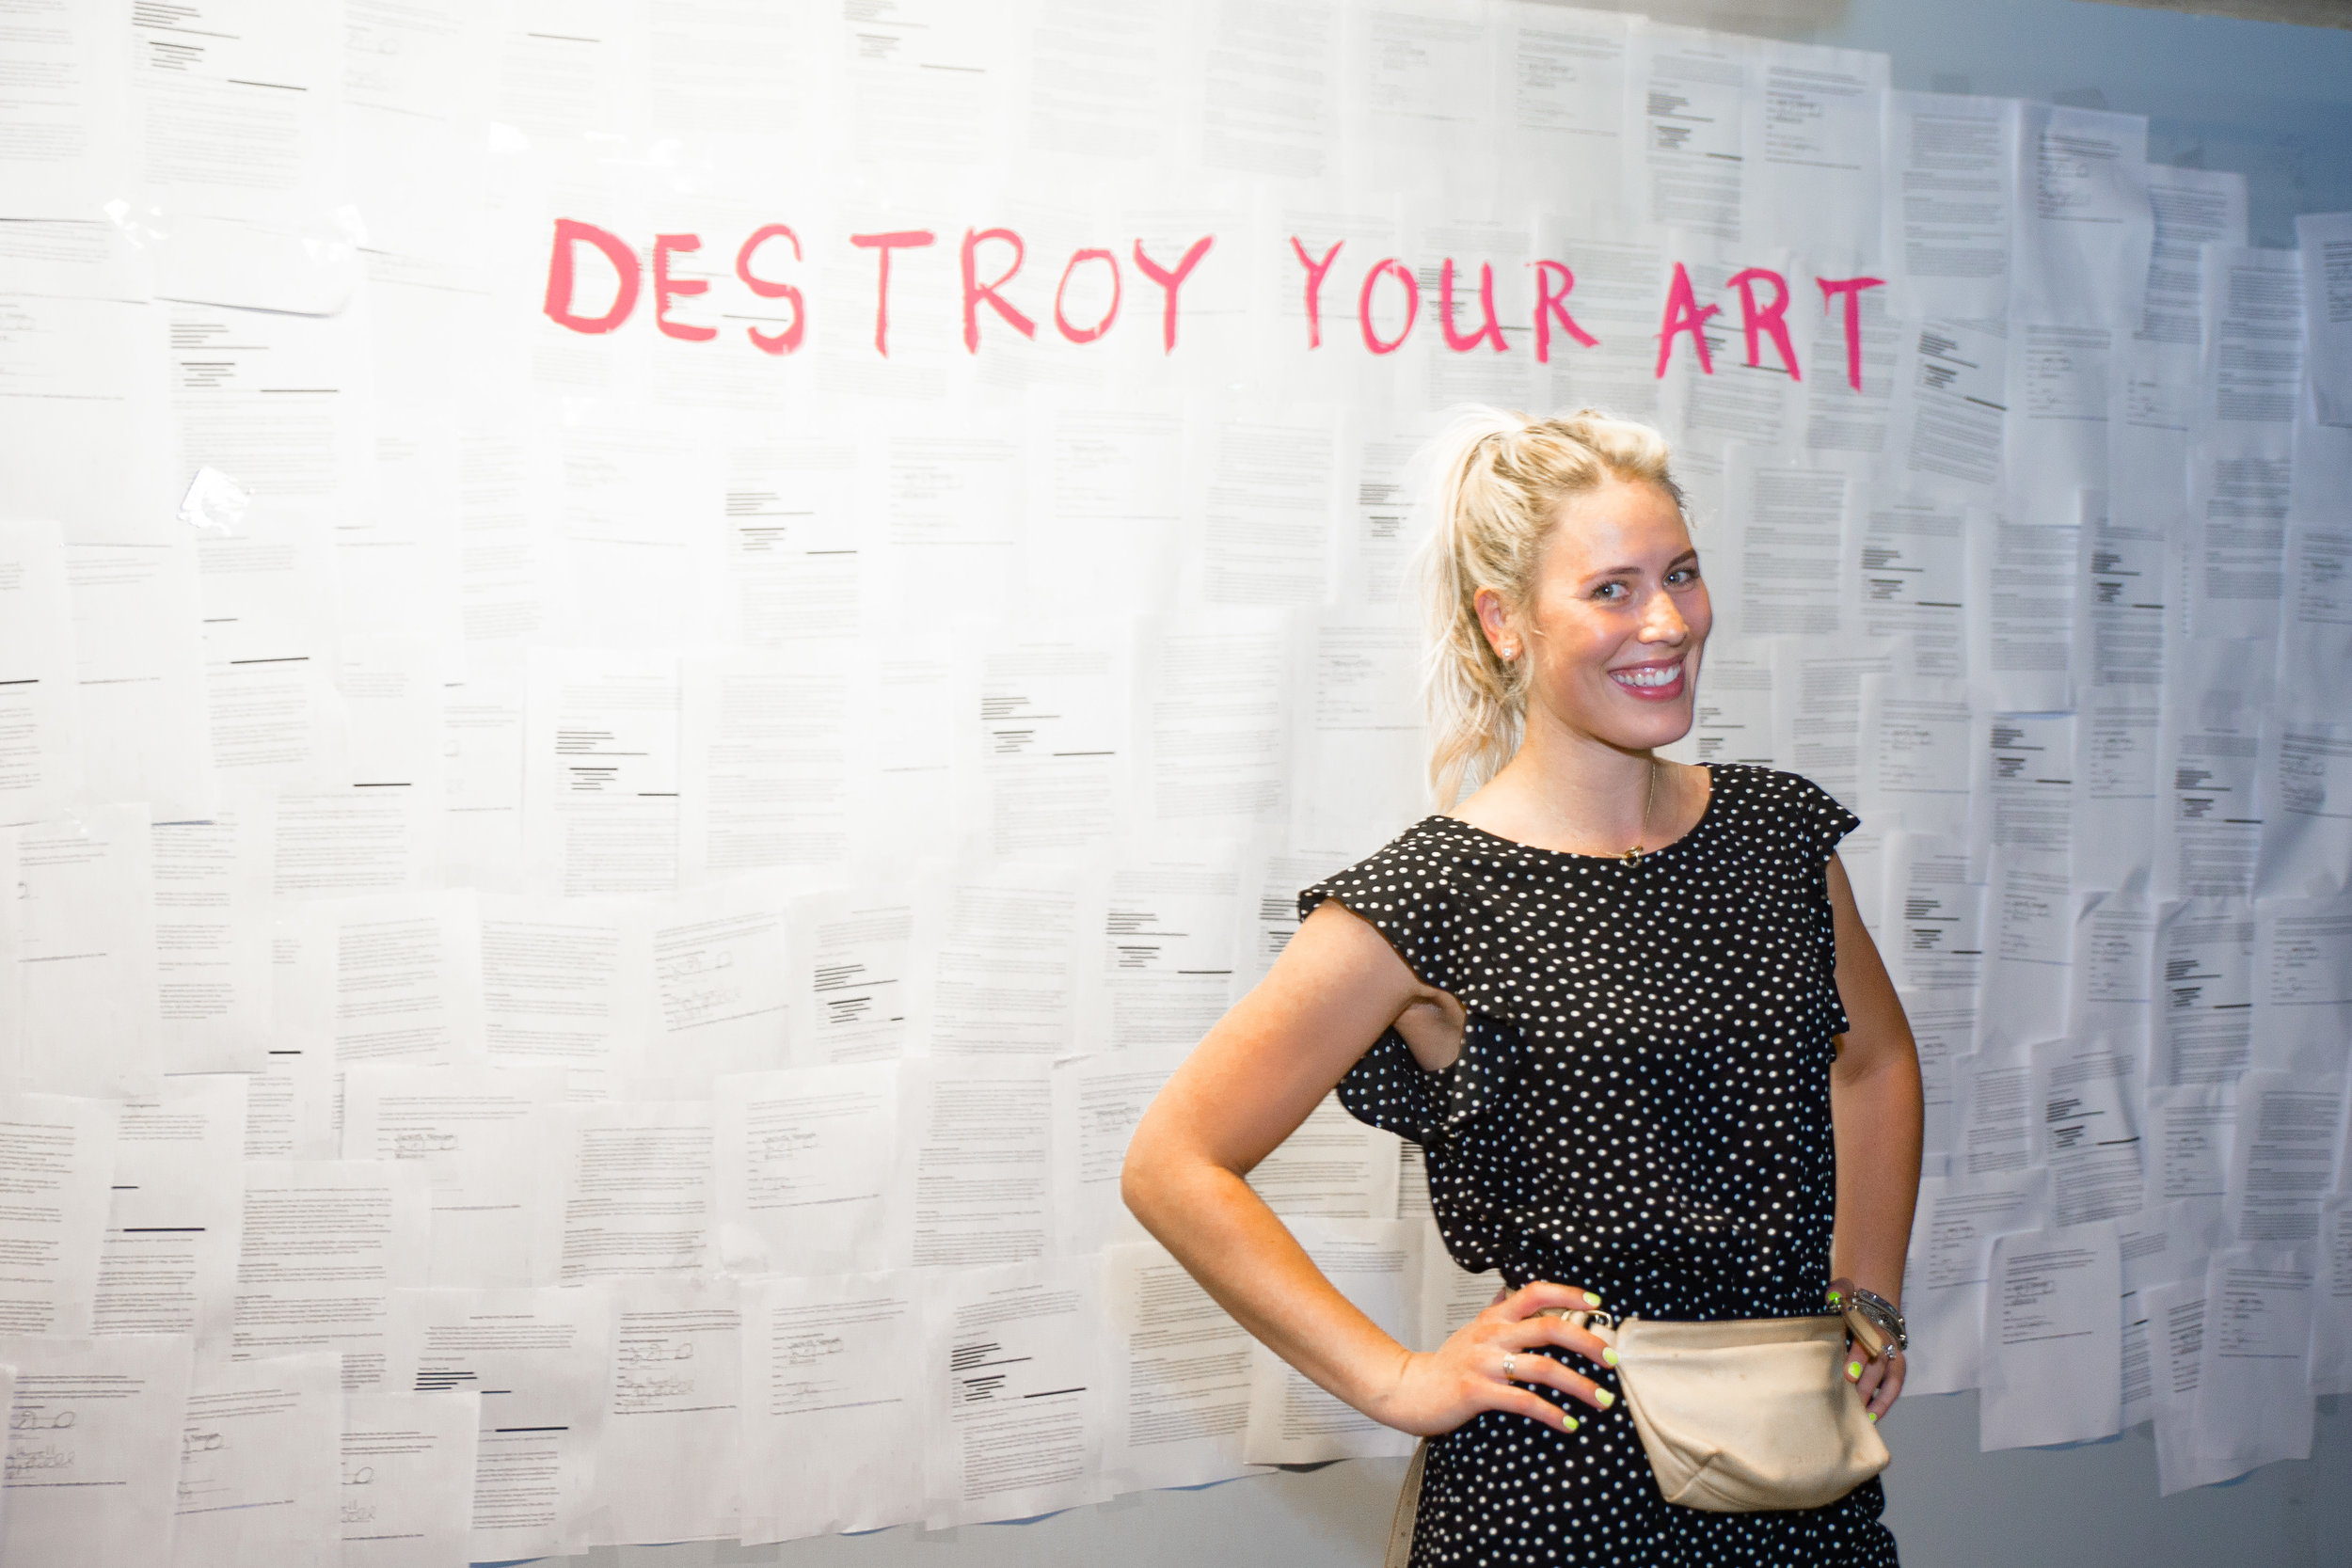 Destroy Your Art 08-10-18 timothymschmidt-1699.jpg